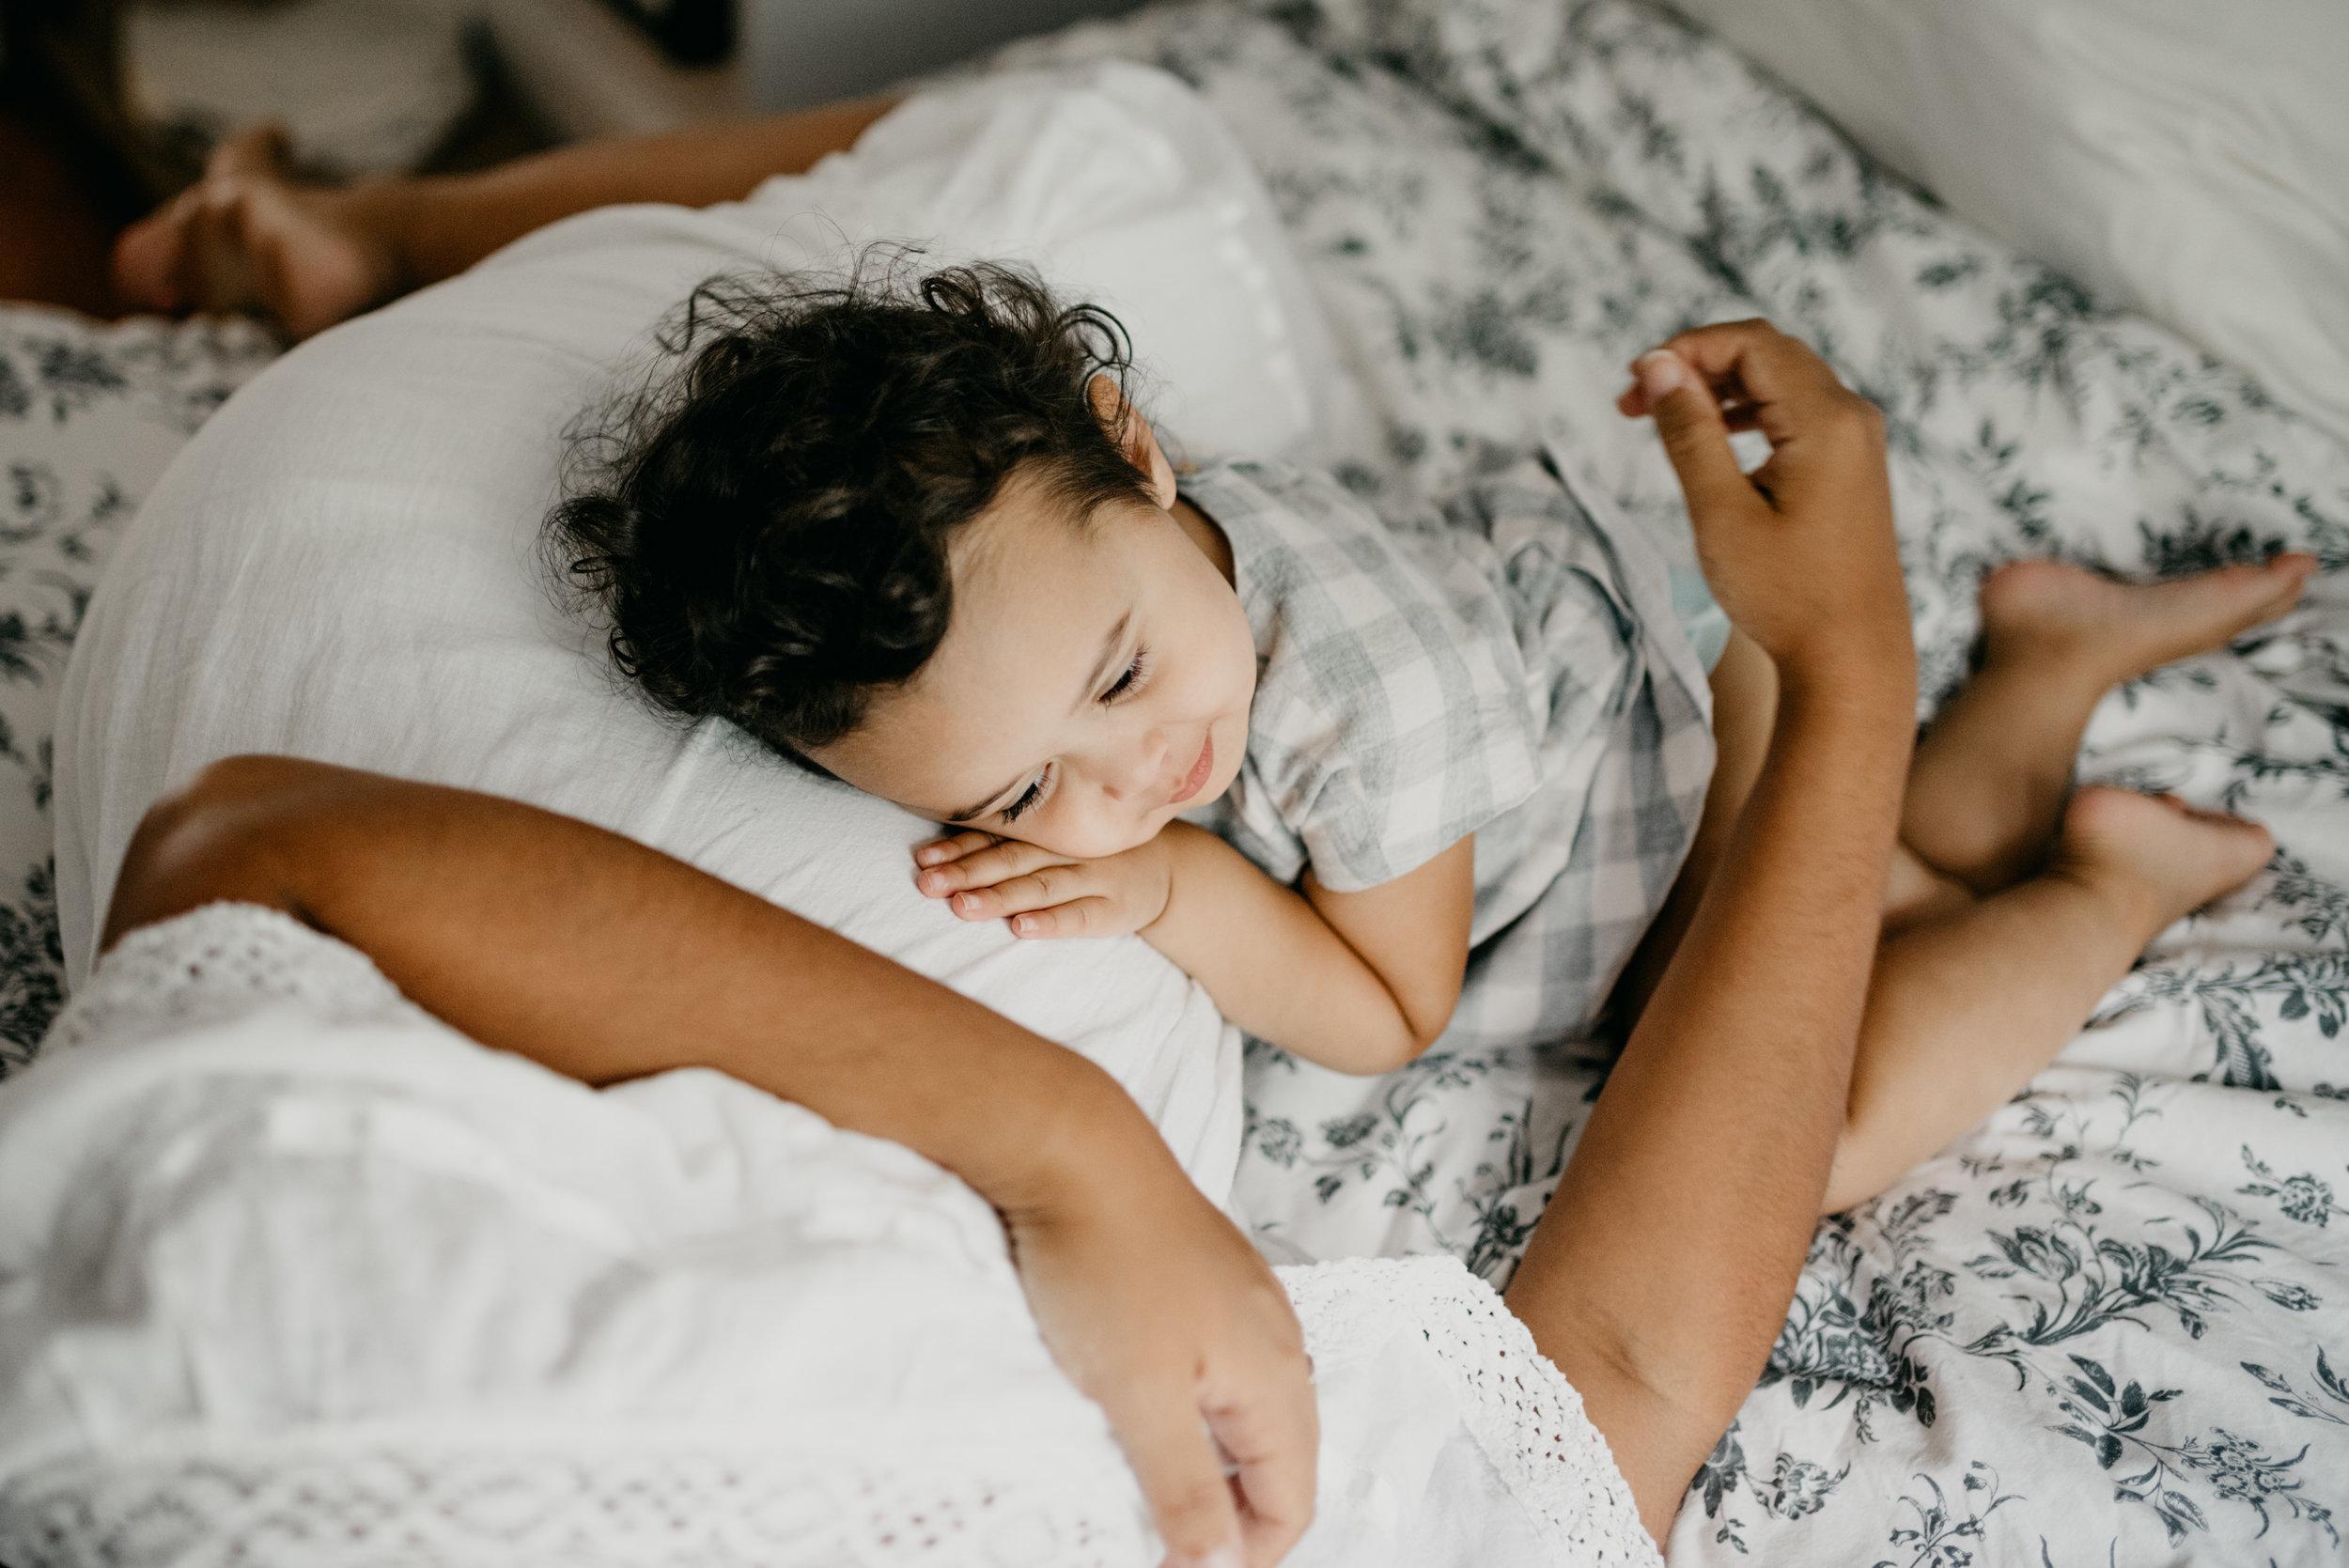 Ehrman-Massachusetts-In Home Lifestyle Maternity Session-Documentary Family Photographer-285.jpg